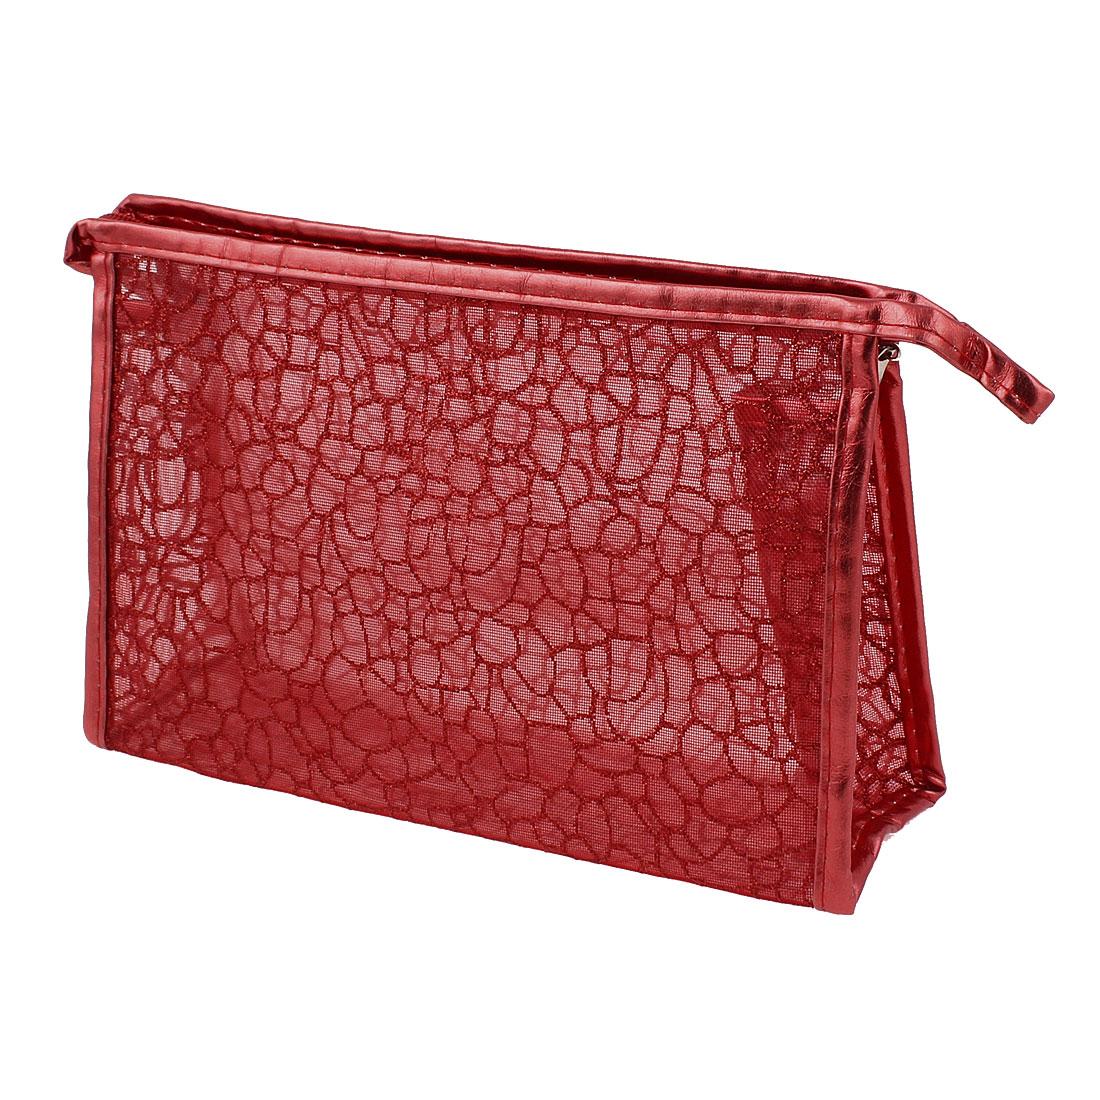 Lady Waterproof Makeup Cosmetic Bag Handbag Organizer Red